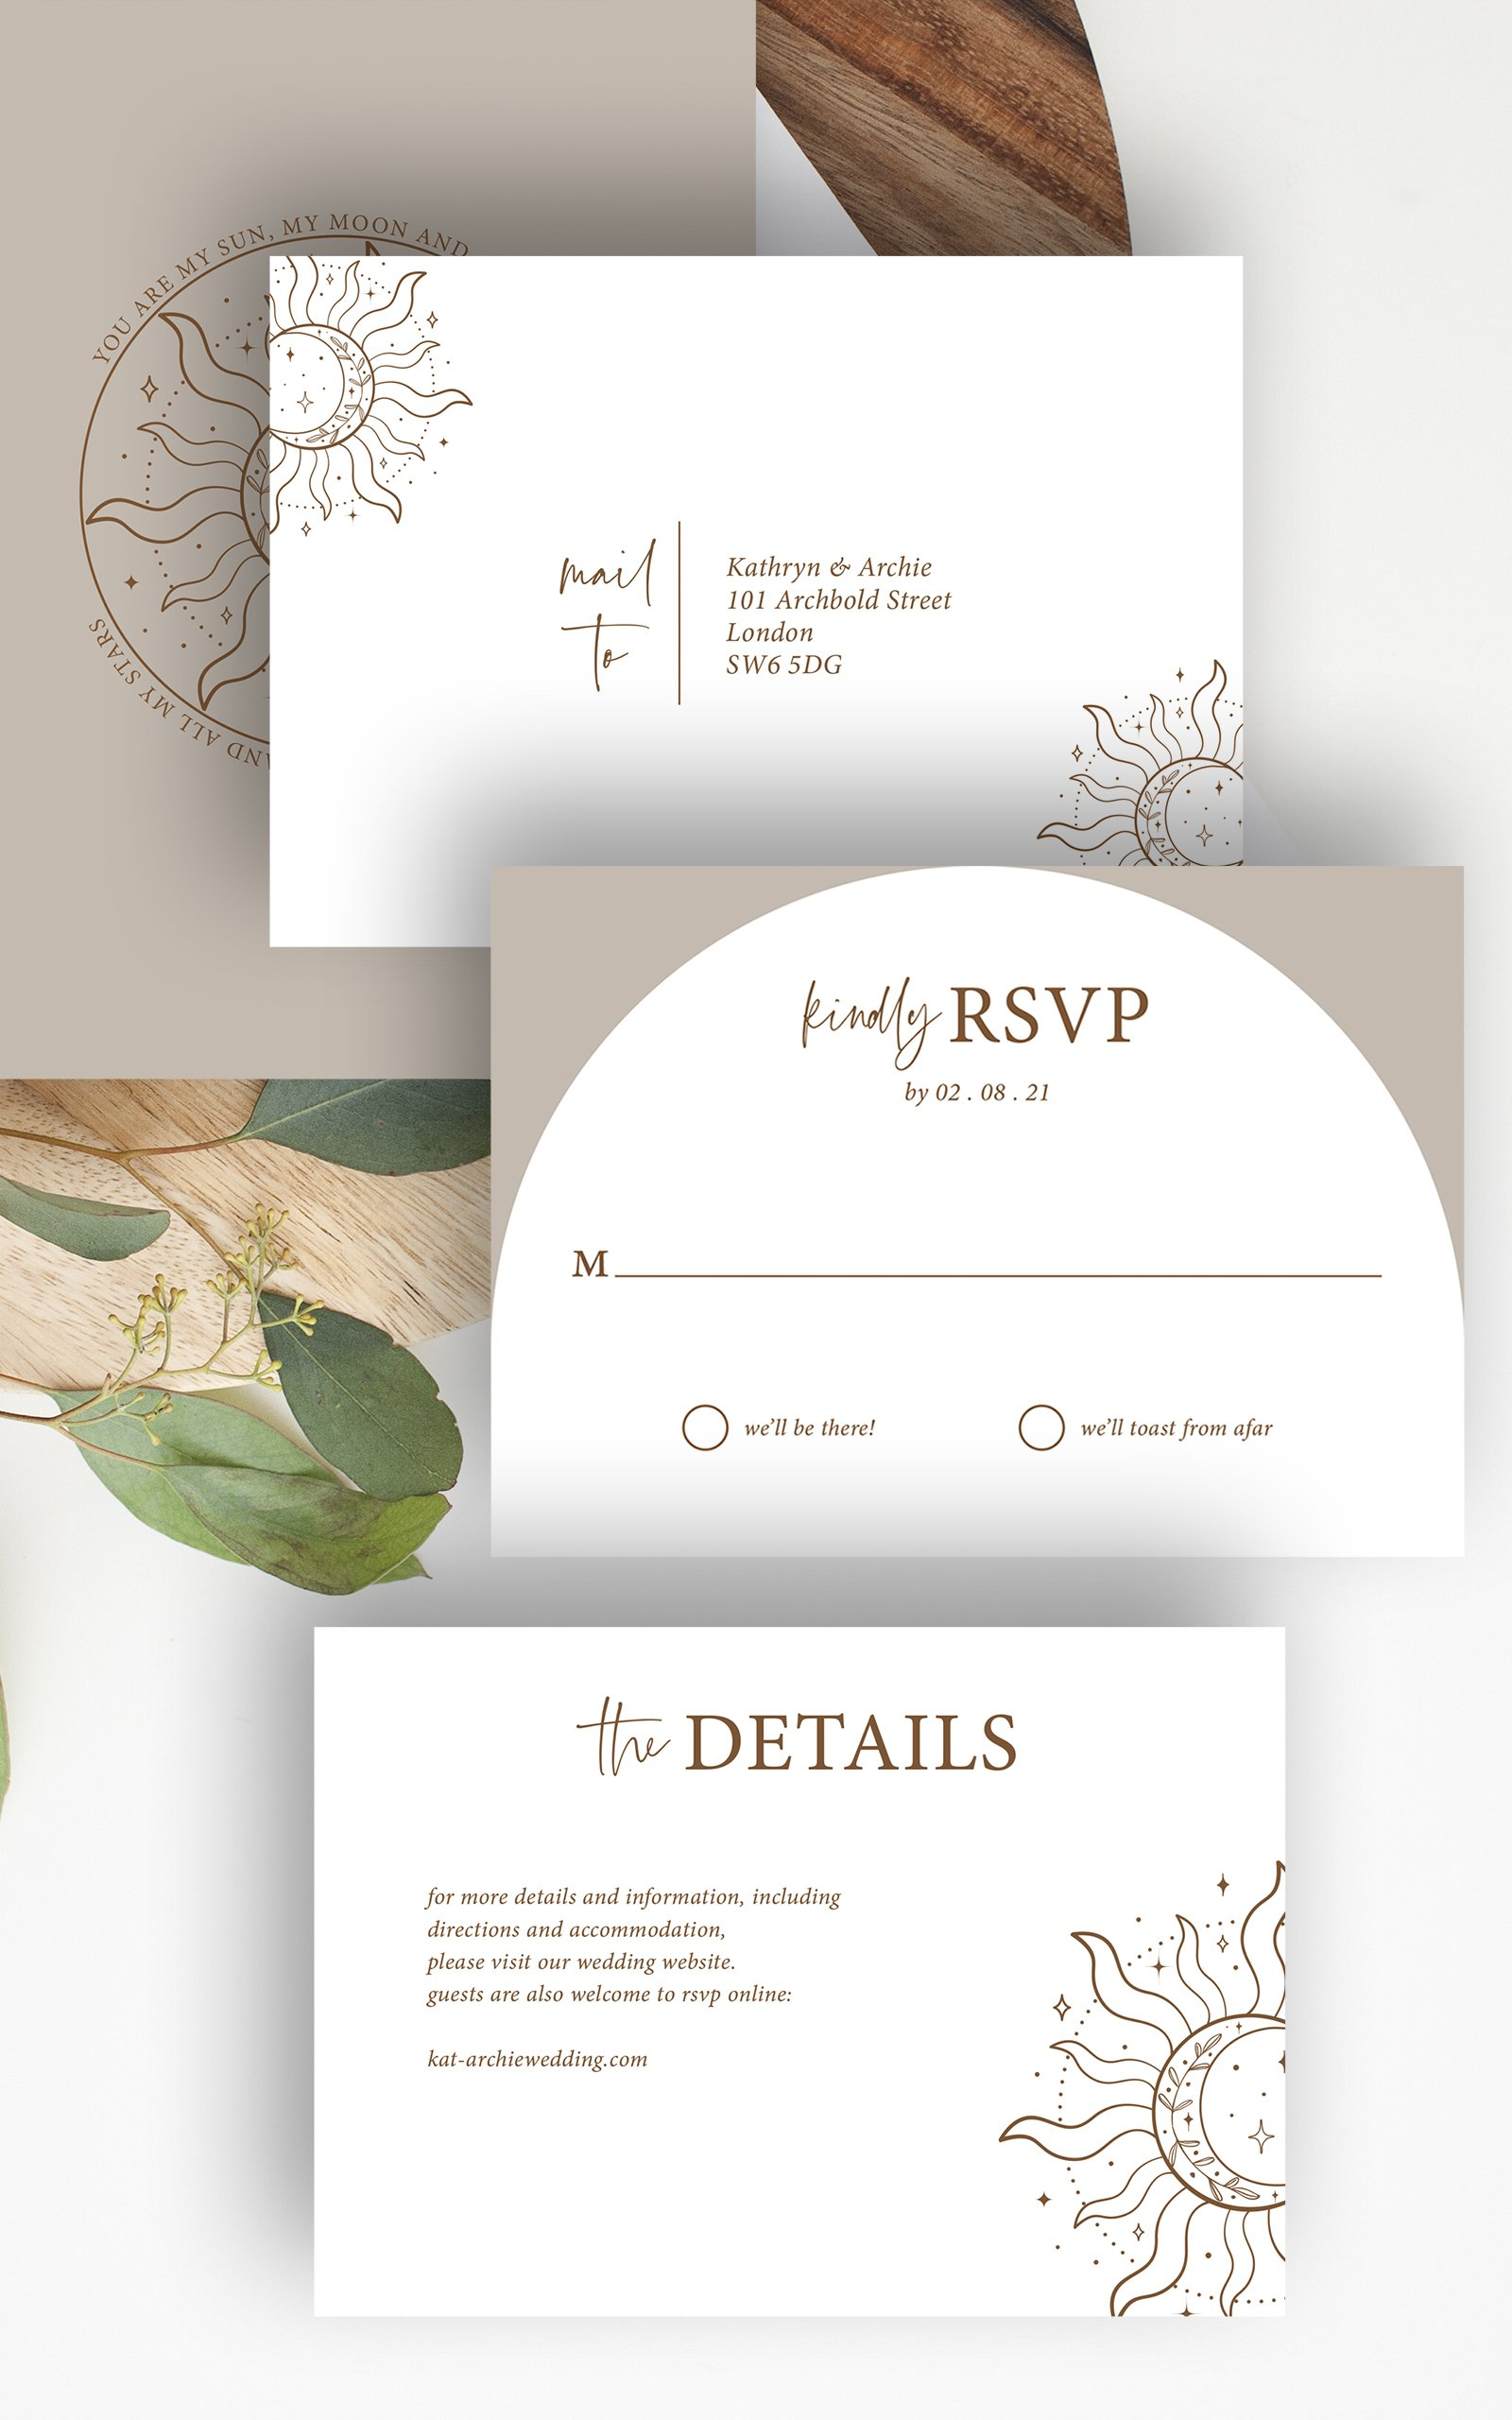 Skye Boho Arched Wedding RSVP Details Card | Flamboyant Invites